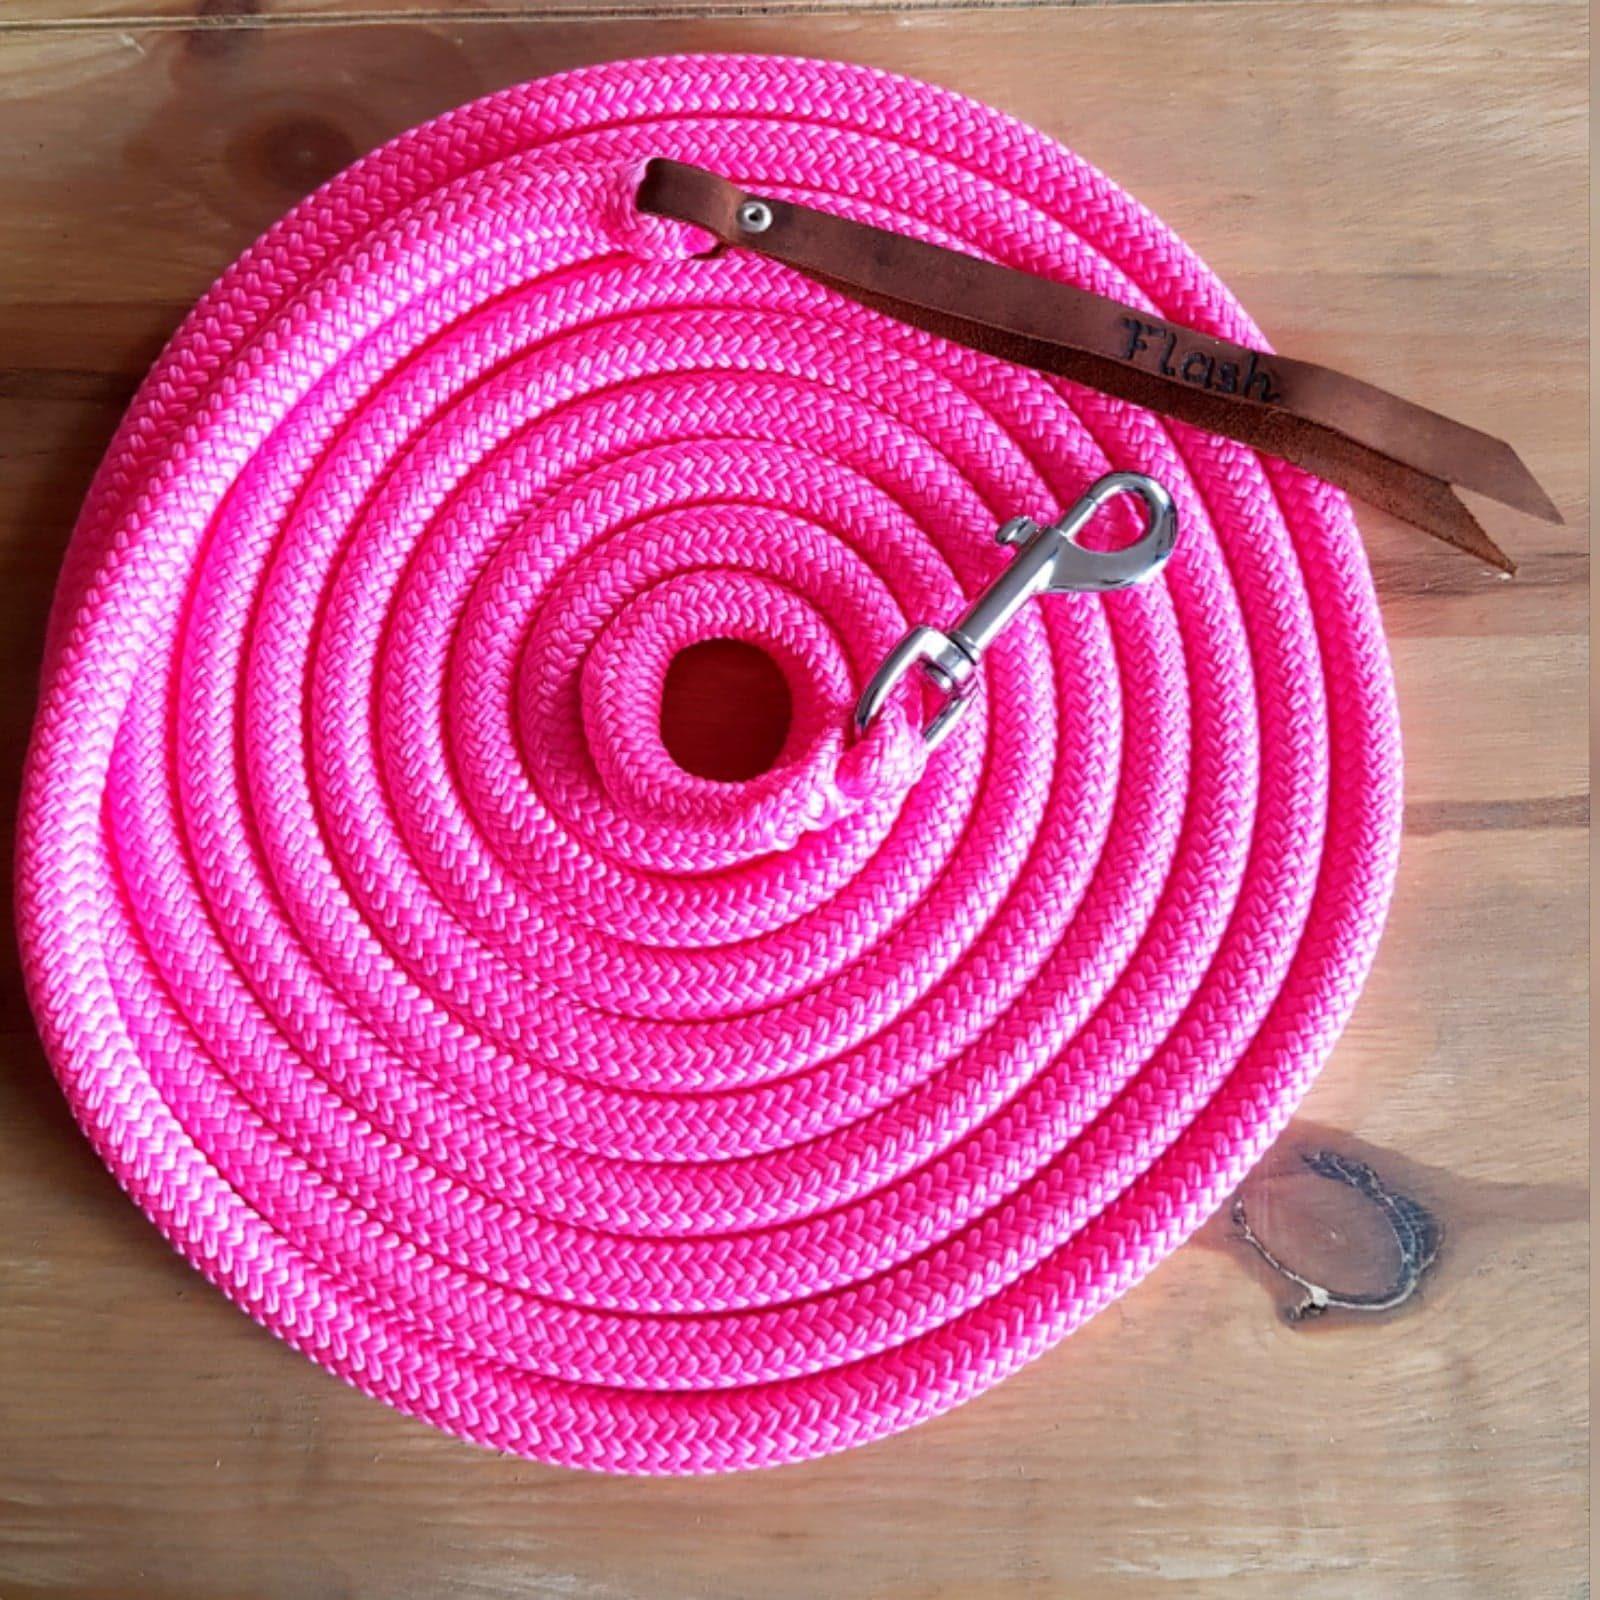 FSHA pretty in pink